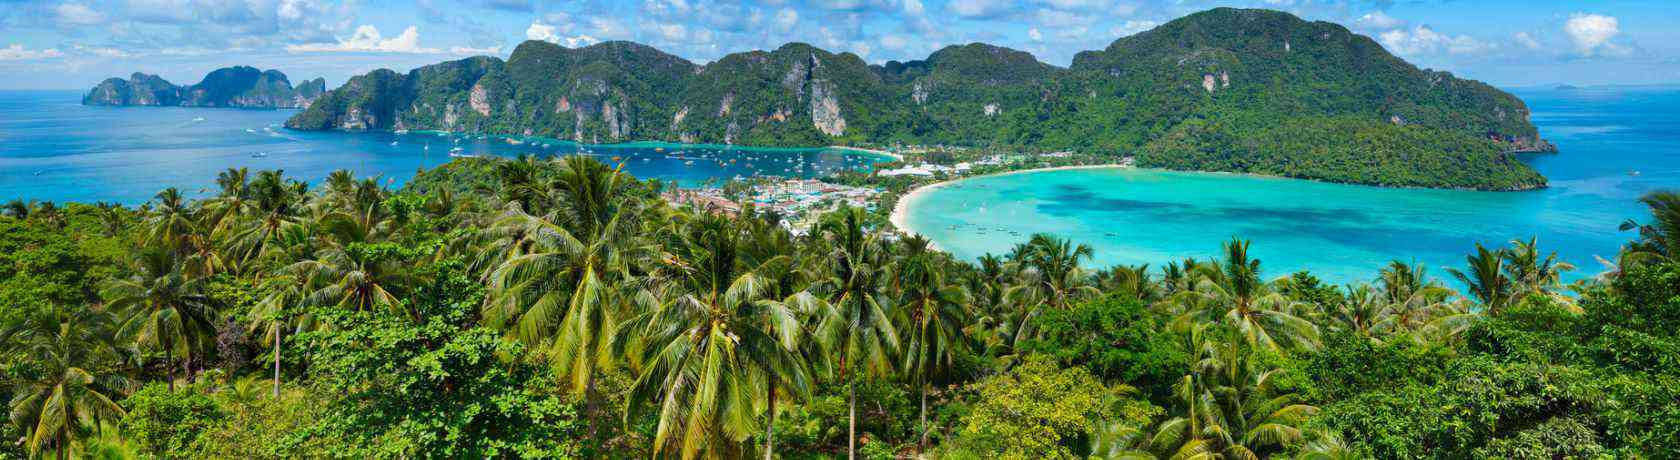 Pokochaj Emiraty, Sri Lankę, Tajlandię ...